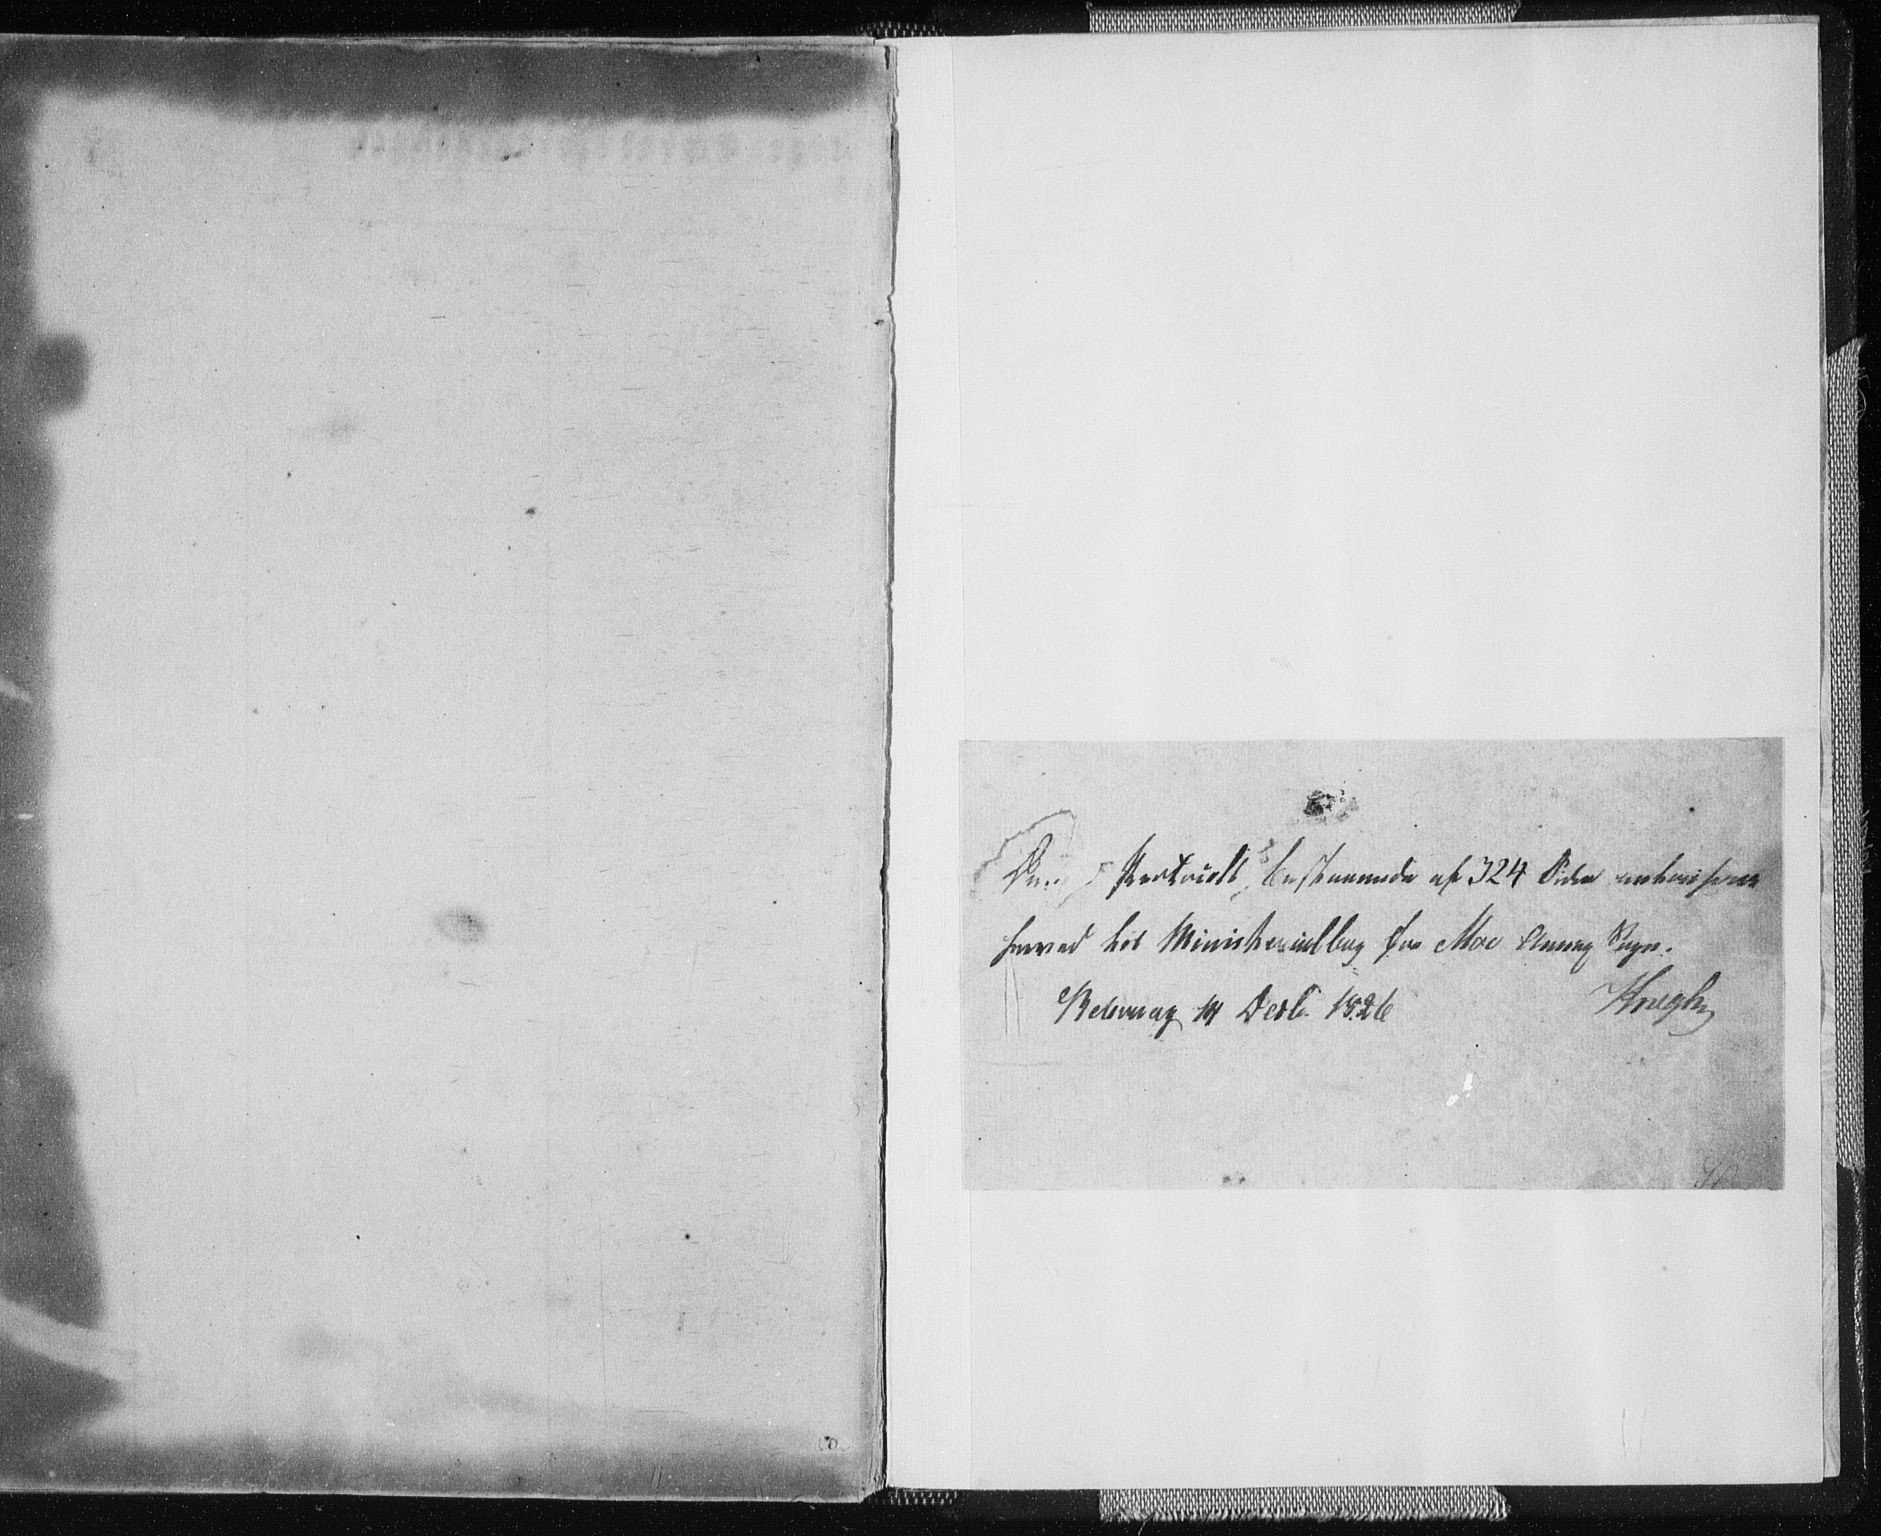 SAT, Ministerialprotokoller, klokkerbøker og fødselsregistre - Nordland, 827/L0390: Ministerialbok nr. 827A02, 1826-1841